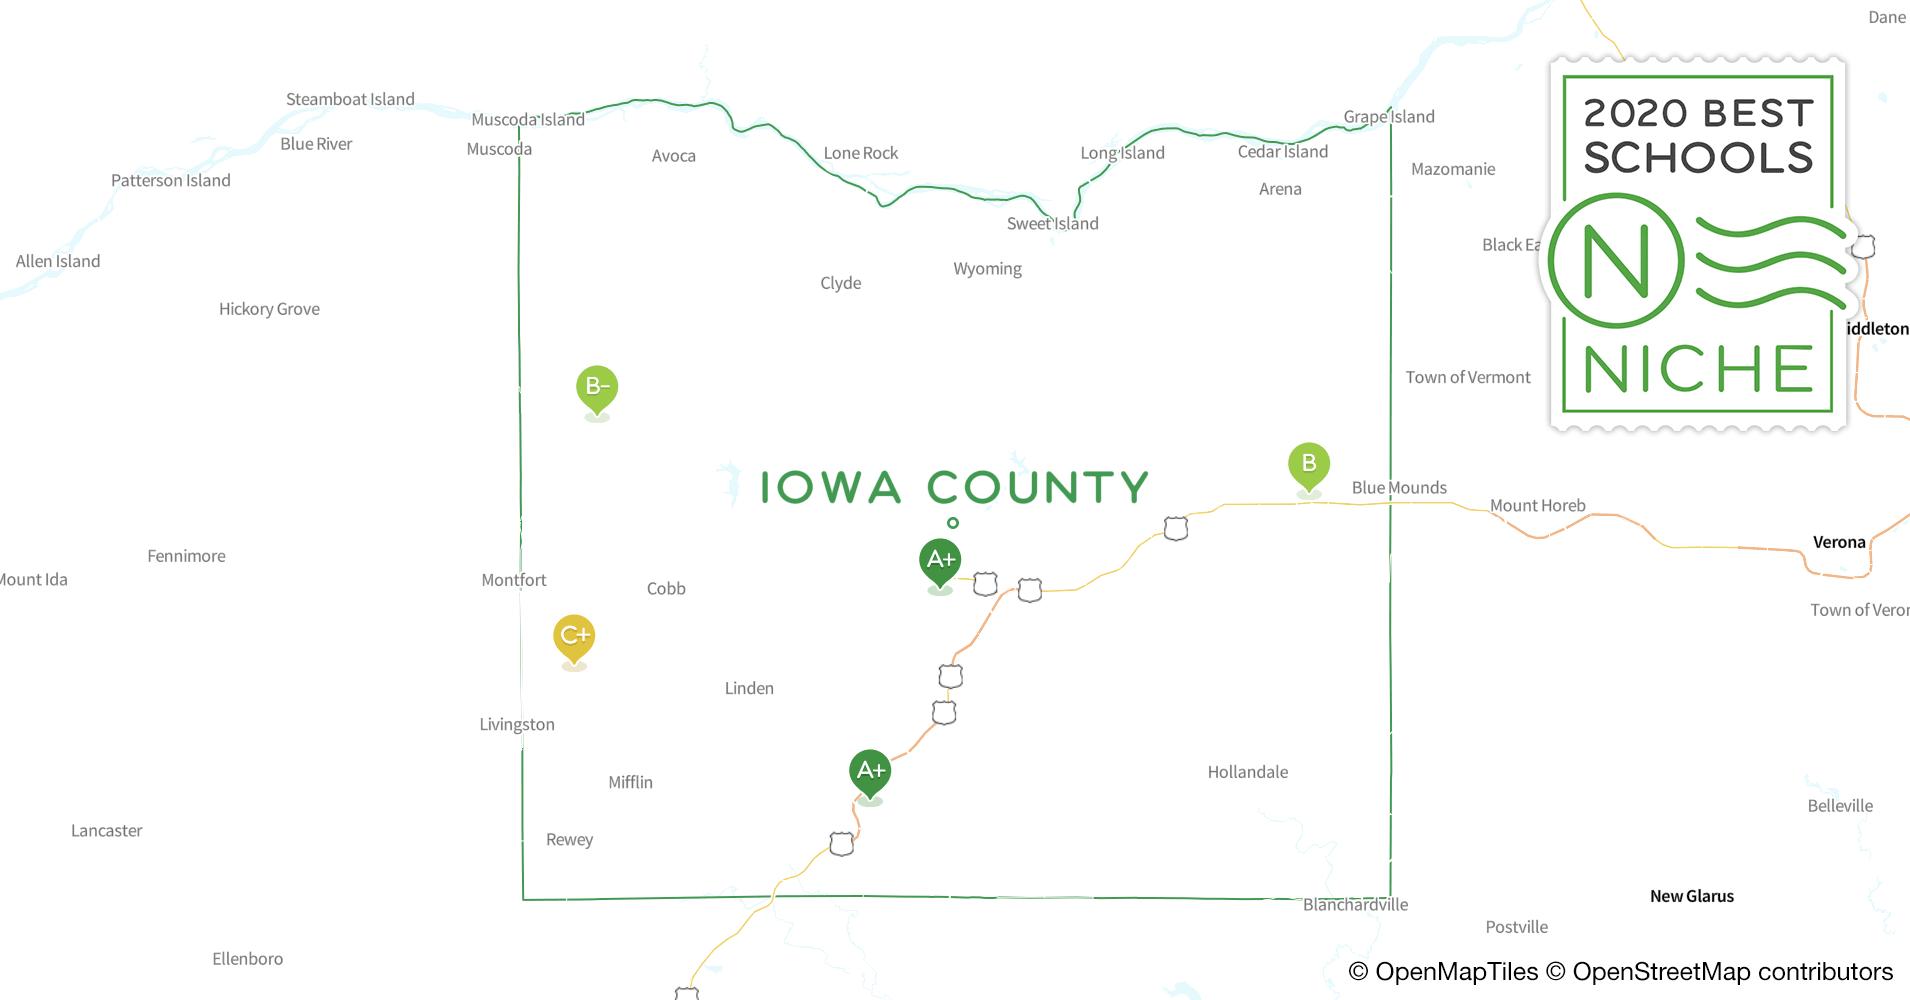 School Districts in Iowa County, WI - Niche